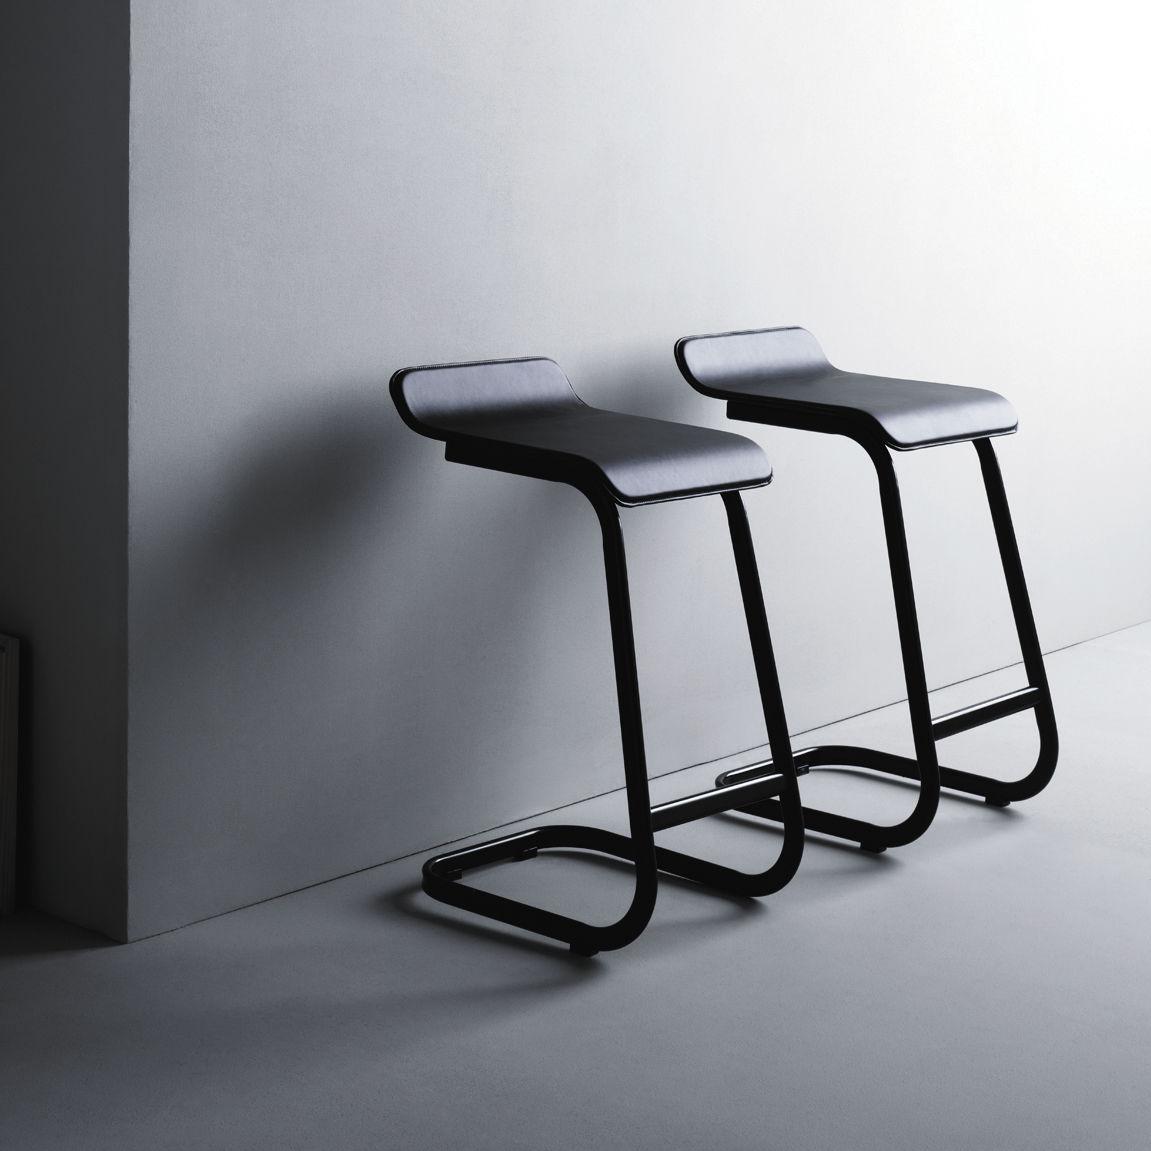 tabouret de bar contemporain en acier professionnel. Black Bedroom Furniture Sets. Home Design Ideas